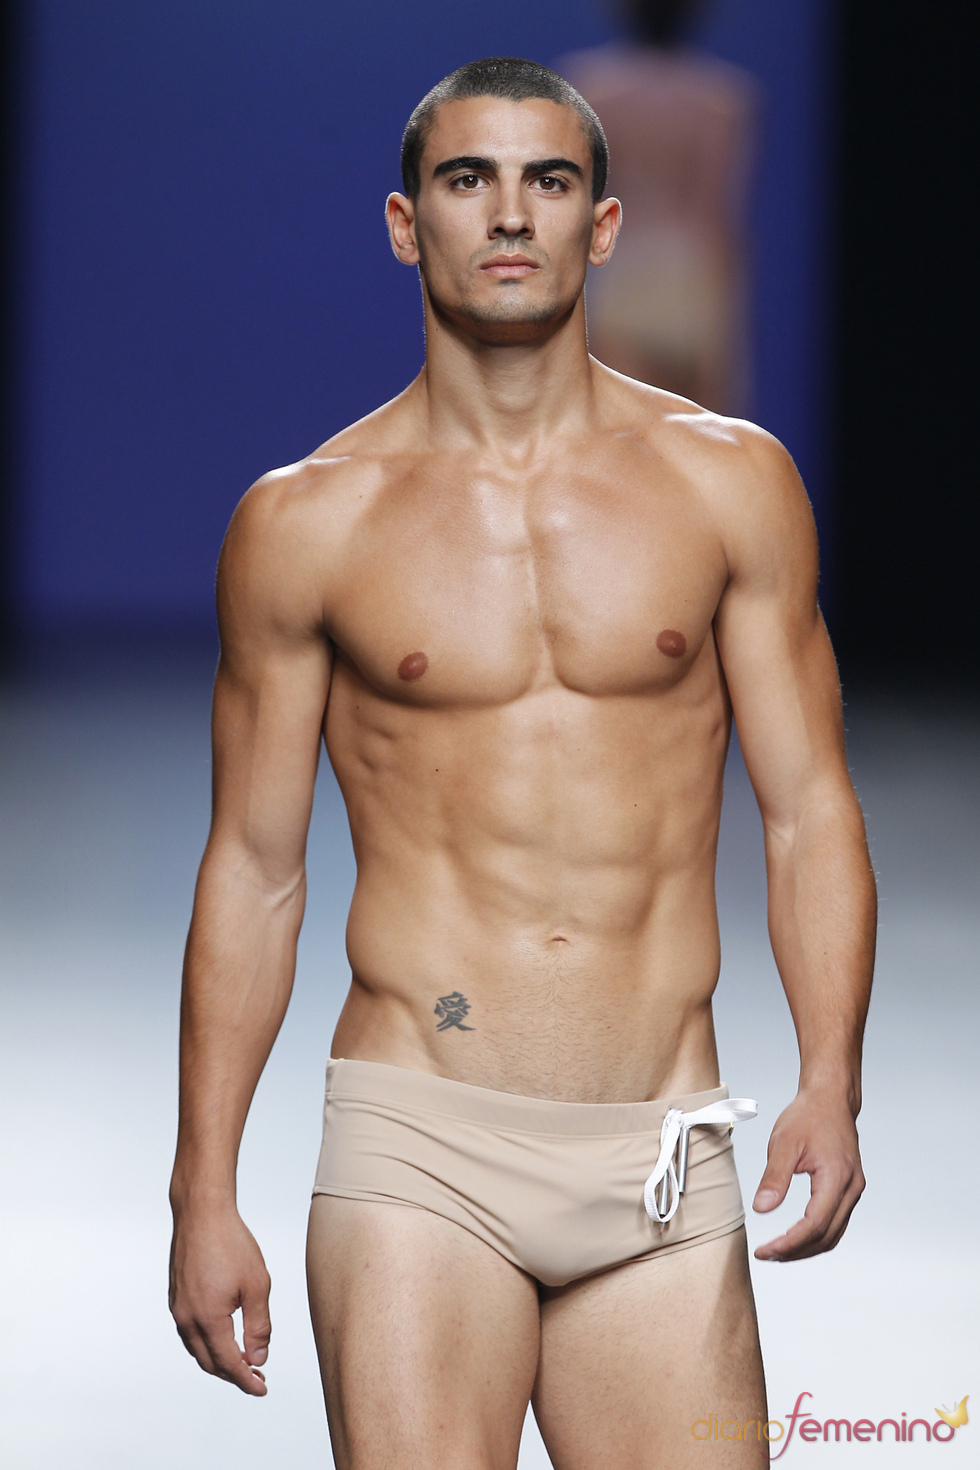 Moda trajes de ba o 2012 - Traje de bano hombre ...